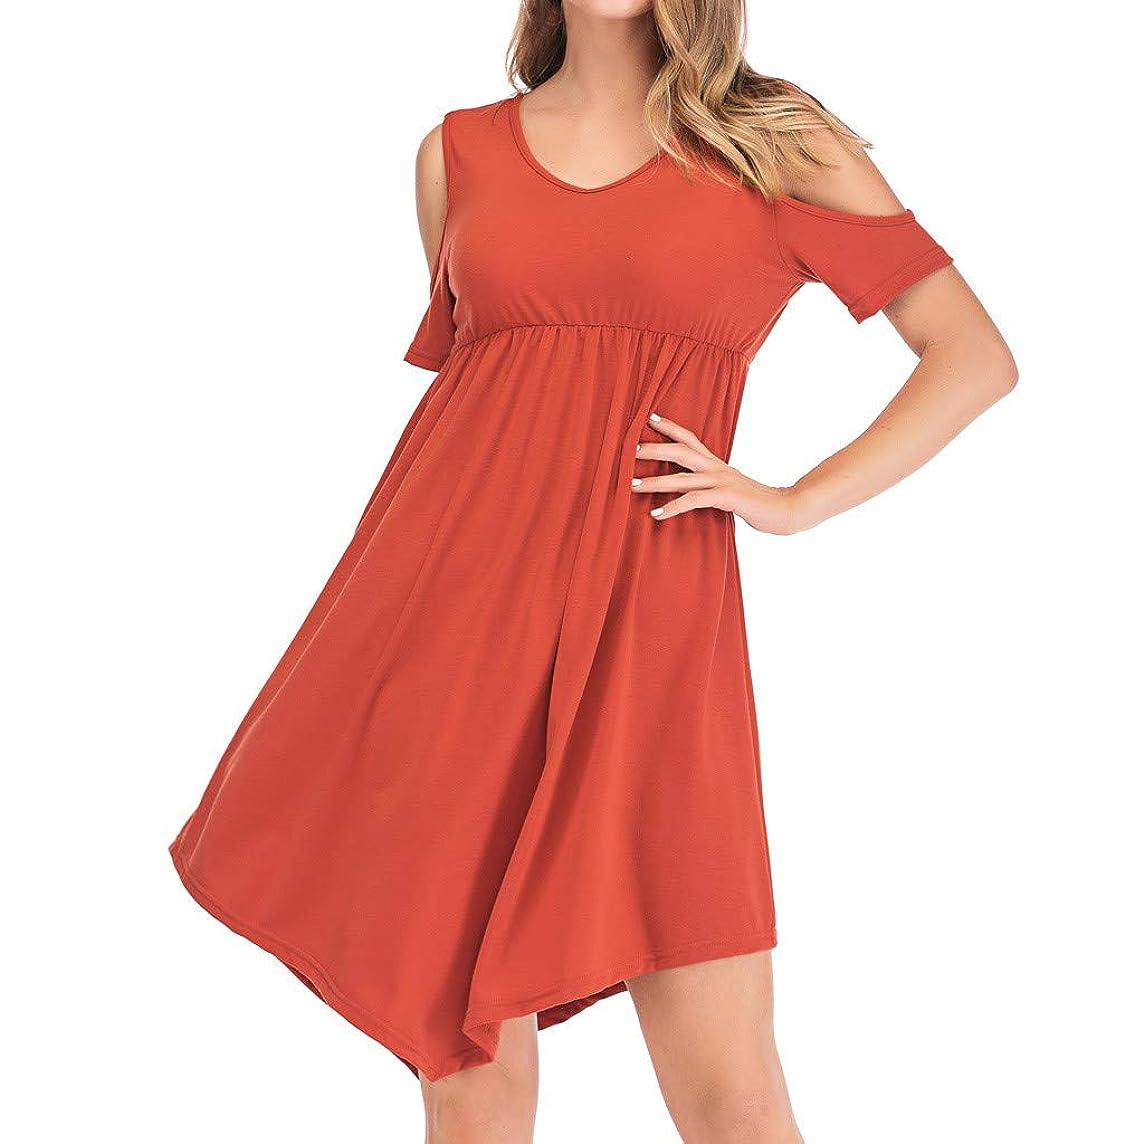 Sagton Asymmetrical Dresses for Women Hem Irregular Casual Short Sleeve Cold-Shoulder Dress